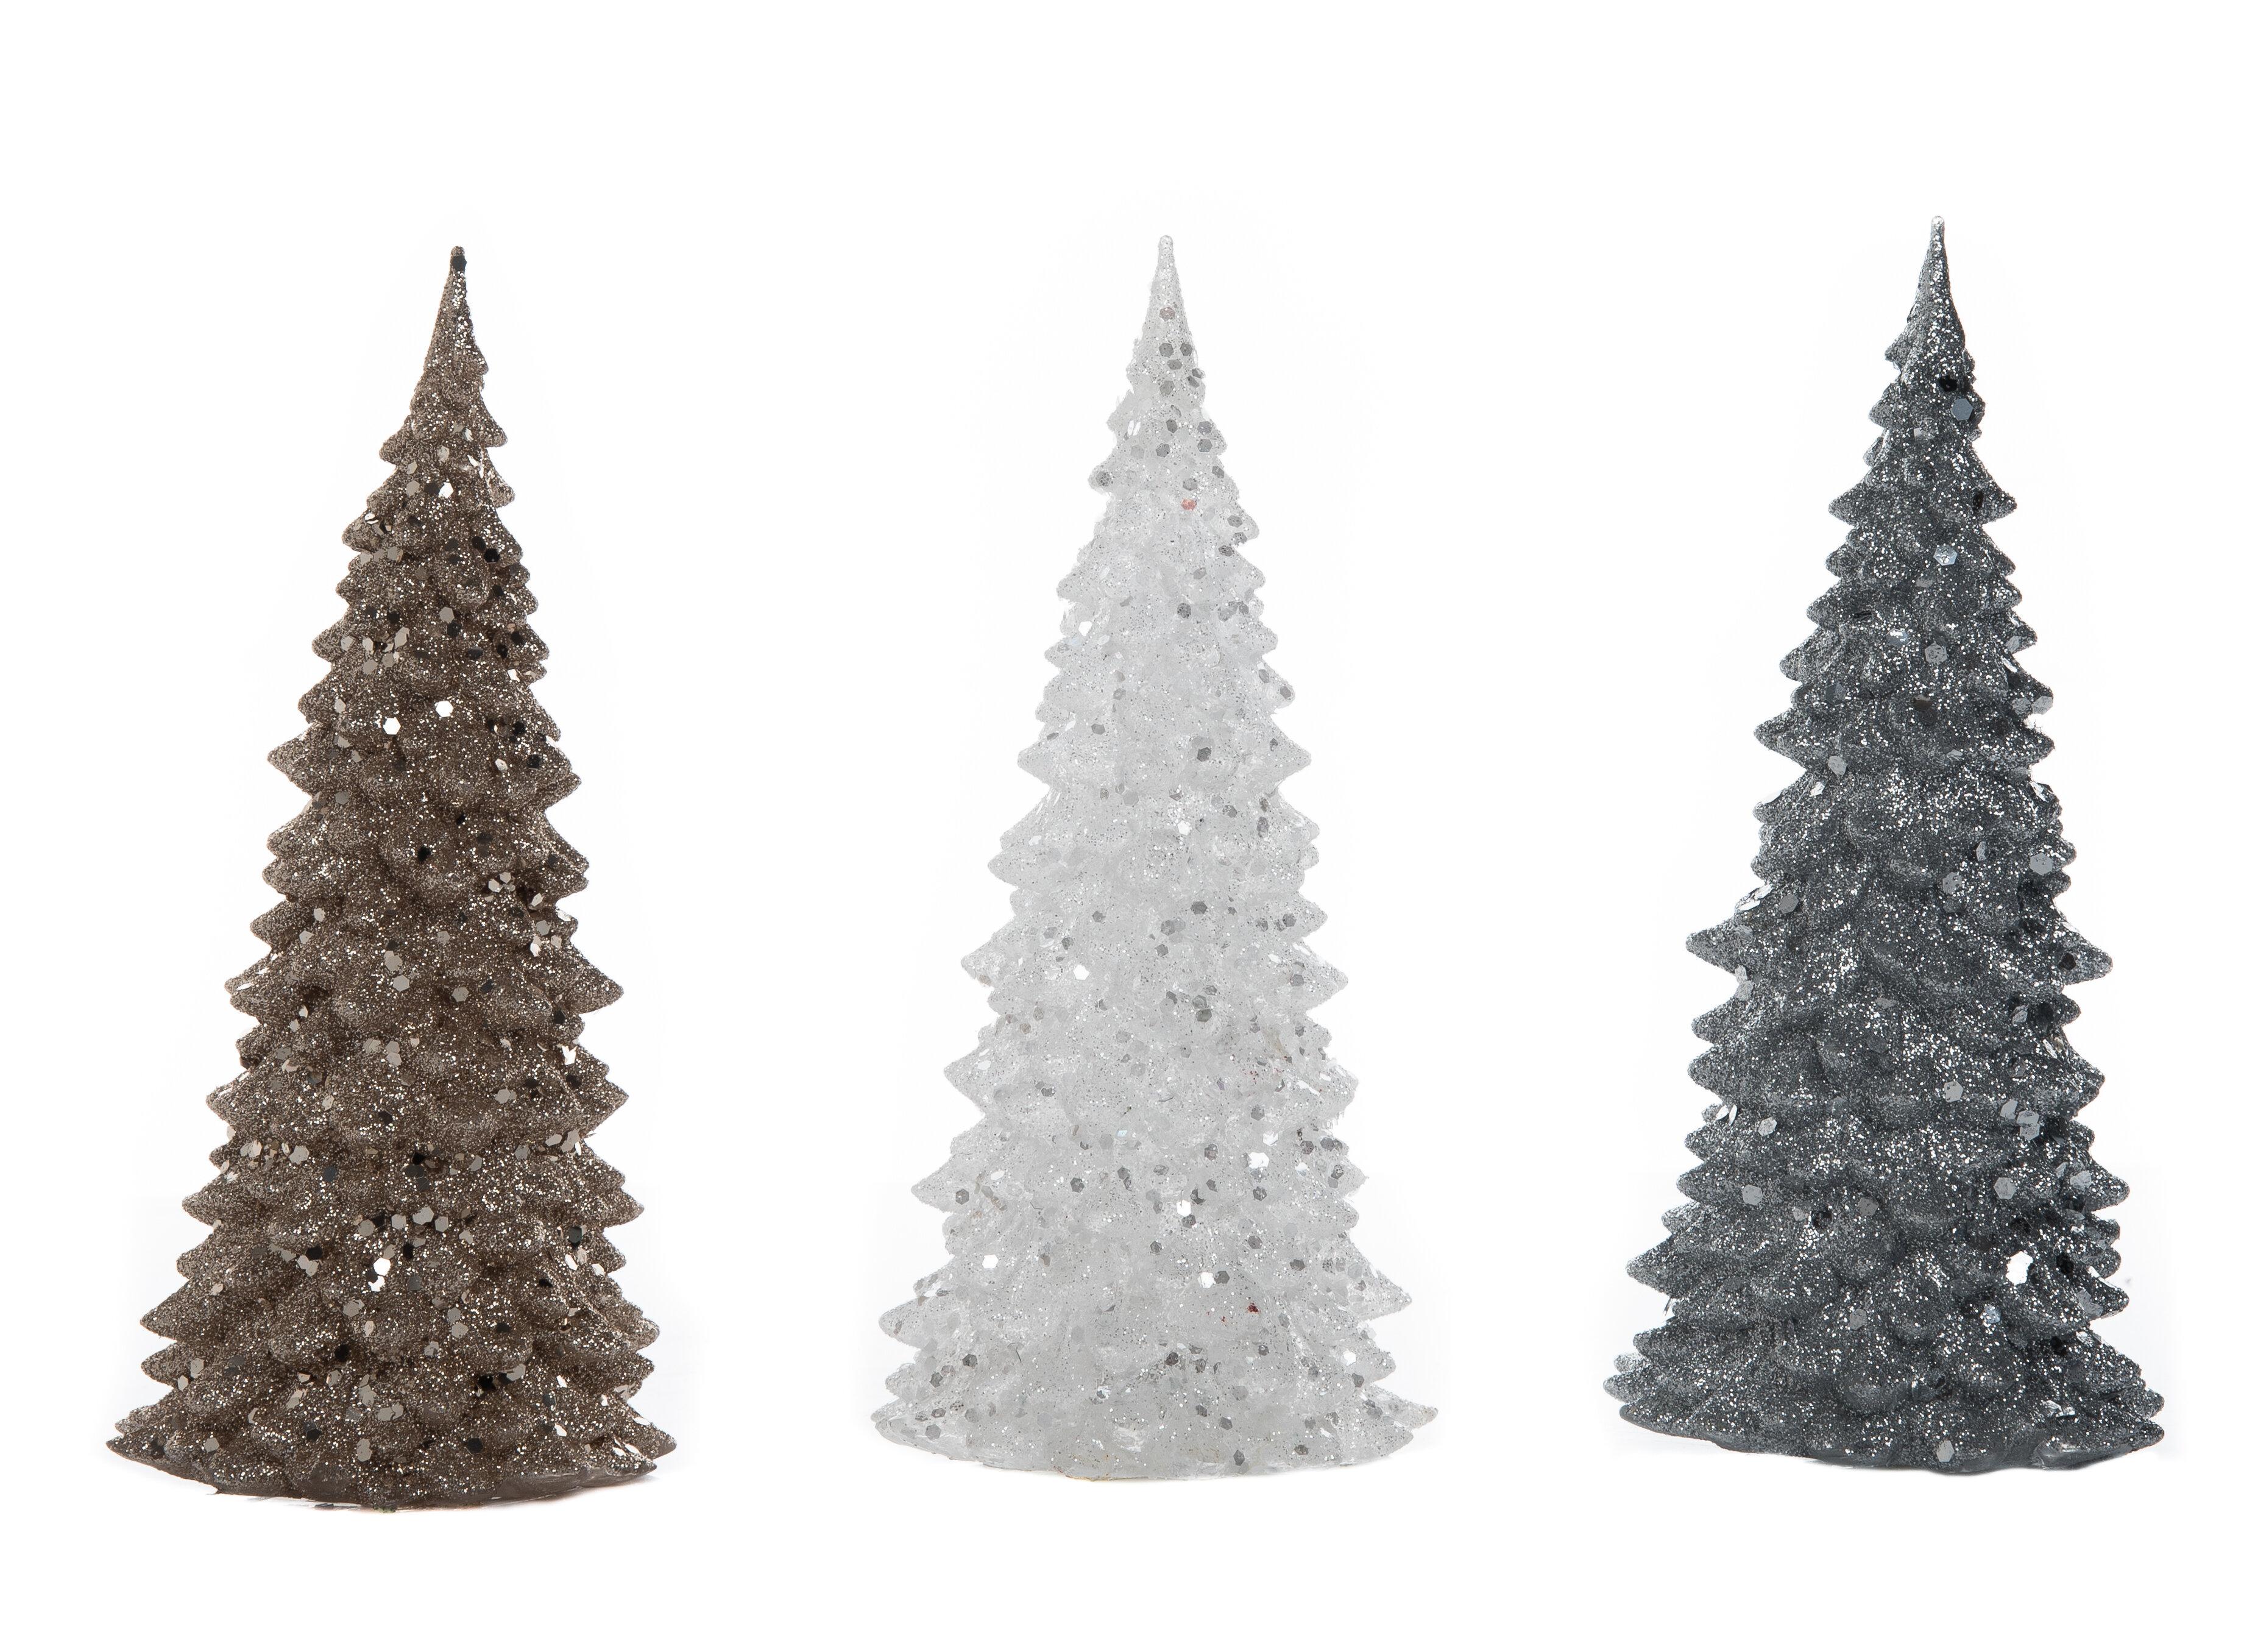 Desmond small acrylic light up christmas tree joss main